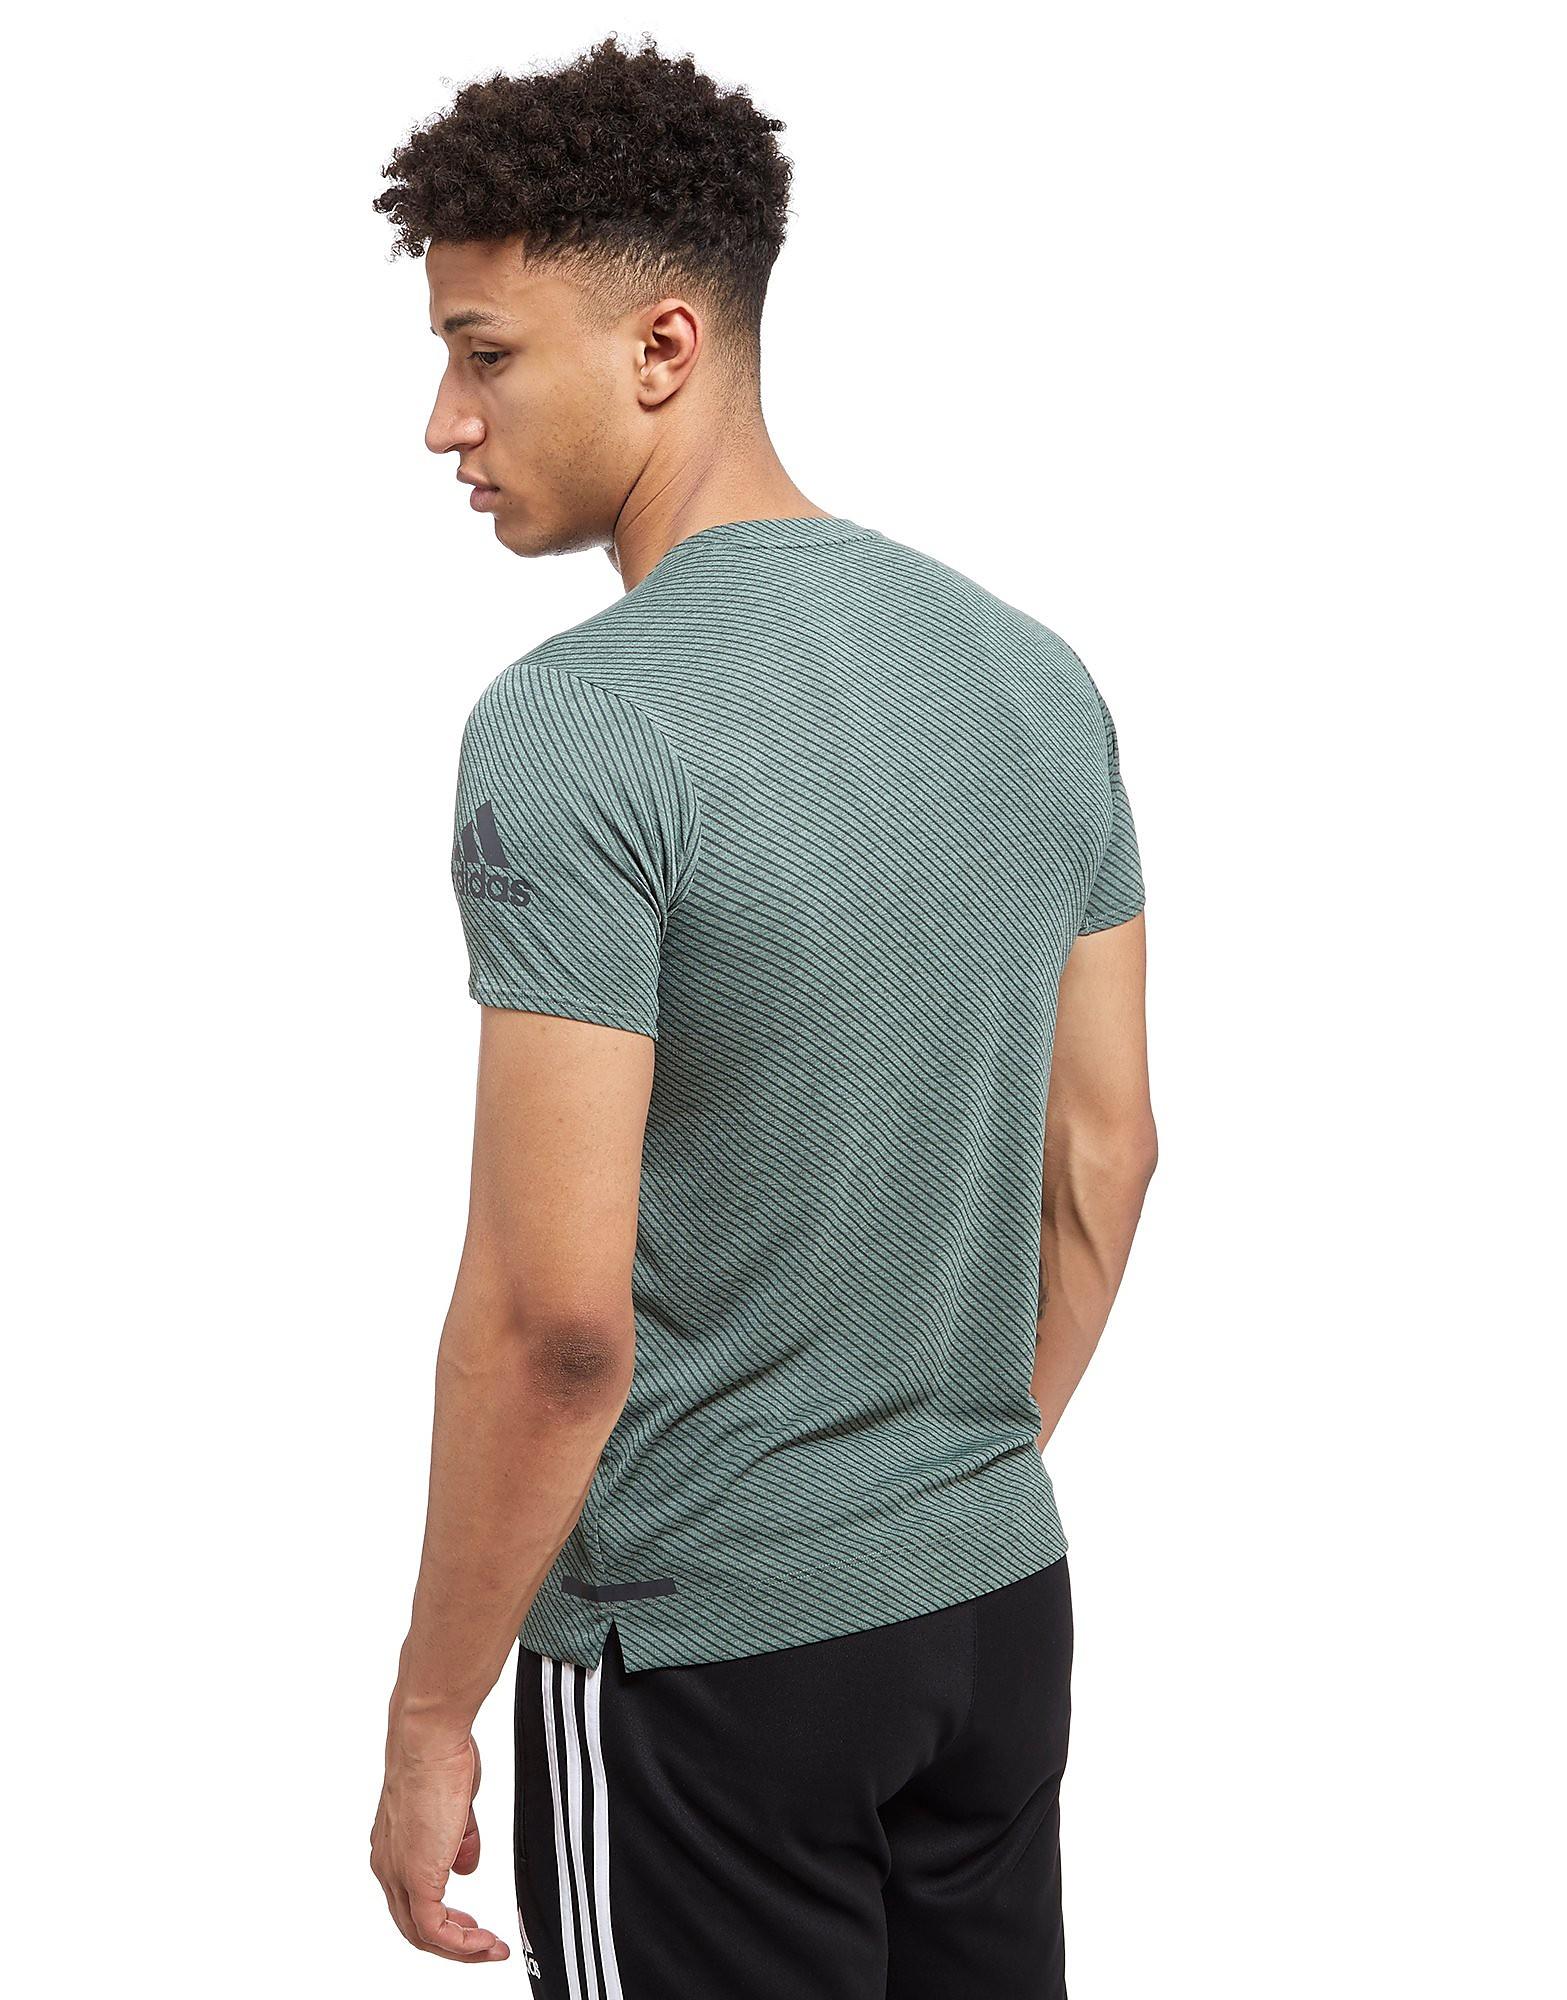 adidas Climachill Speed Stripes Freelift T-Shirt